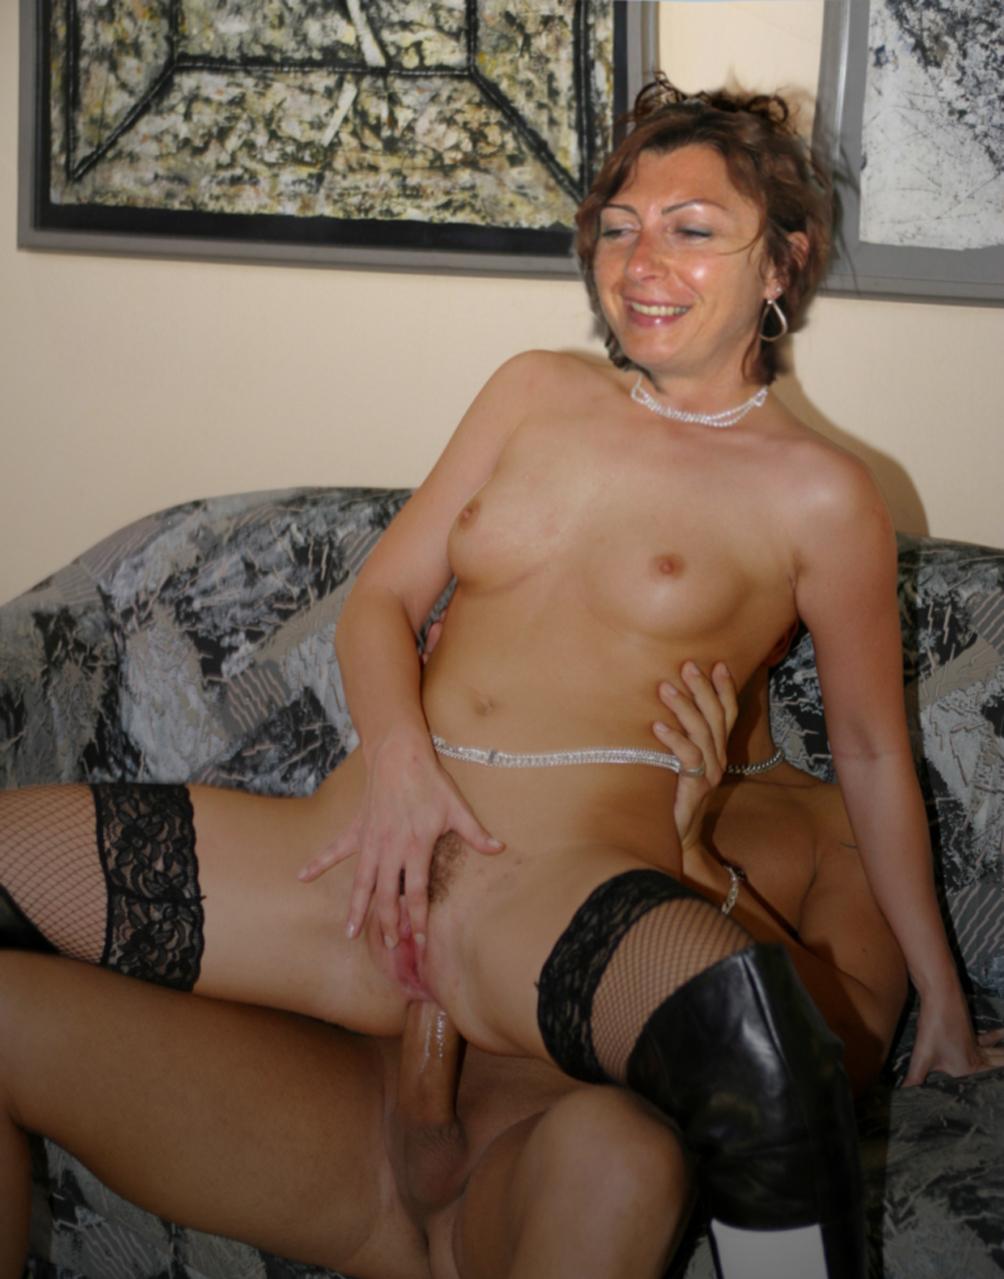 Секс и месть jessica fiorentino порно онлайн 10 фотография